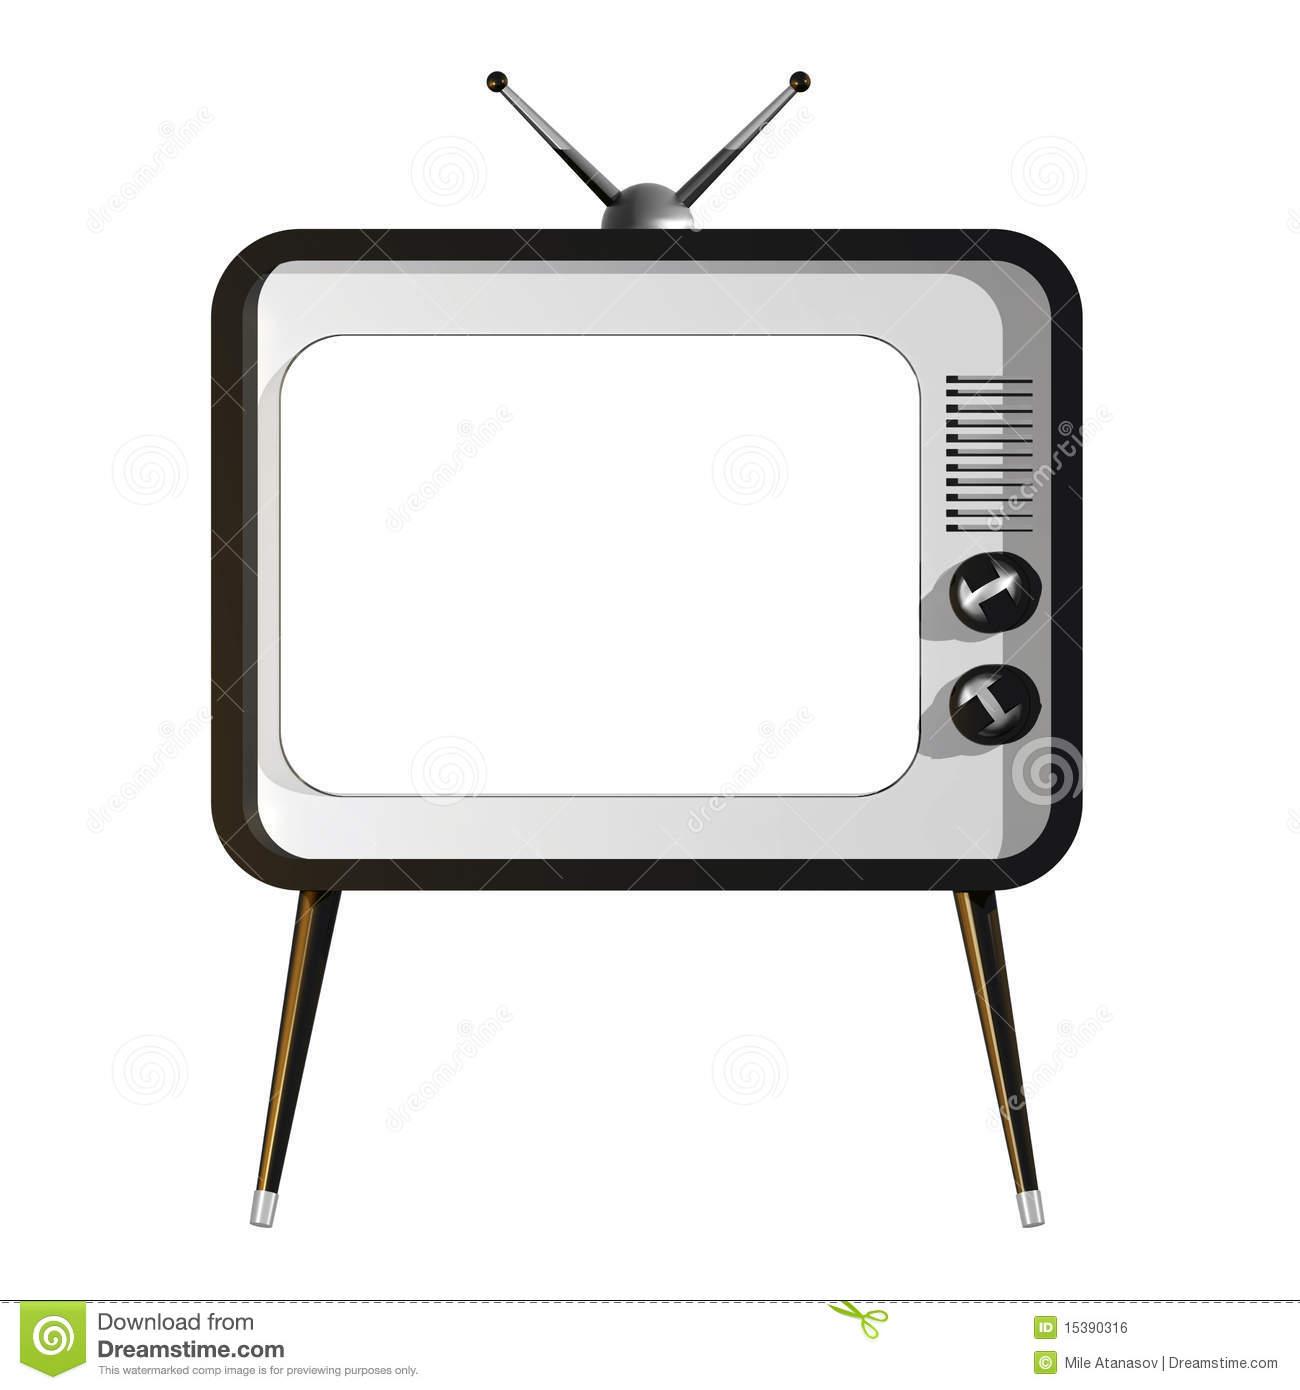 TV with empty screen stock illustration. Illustration of.